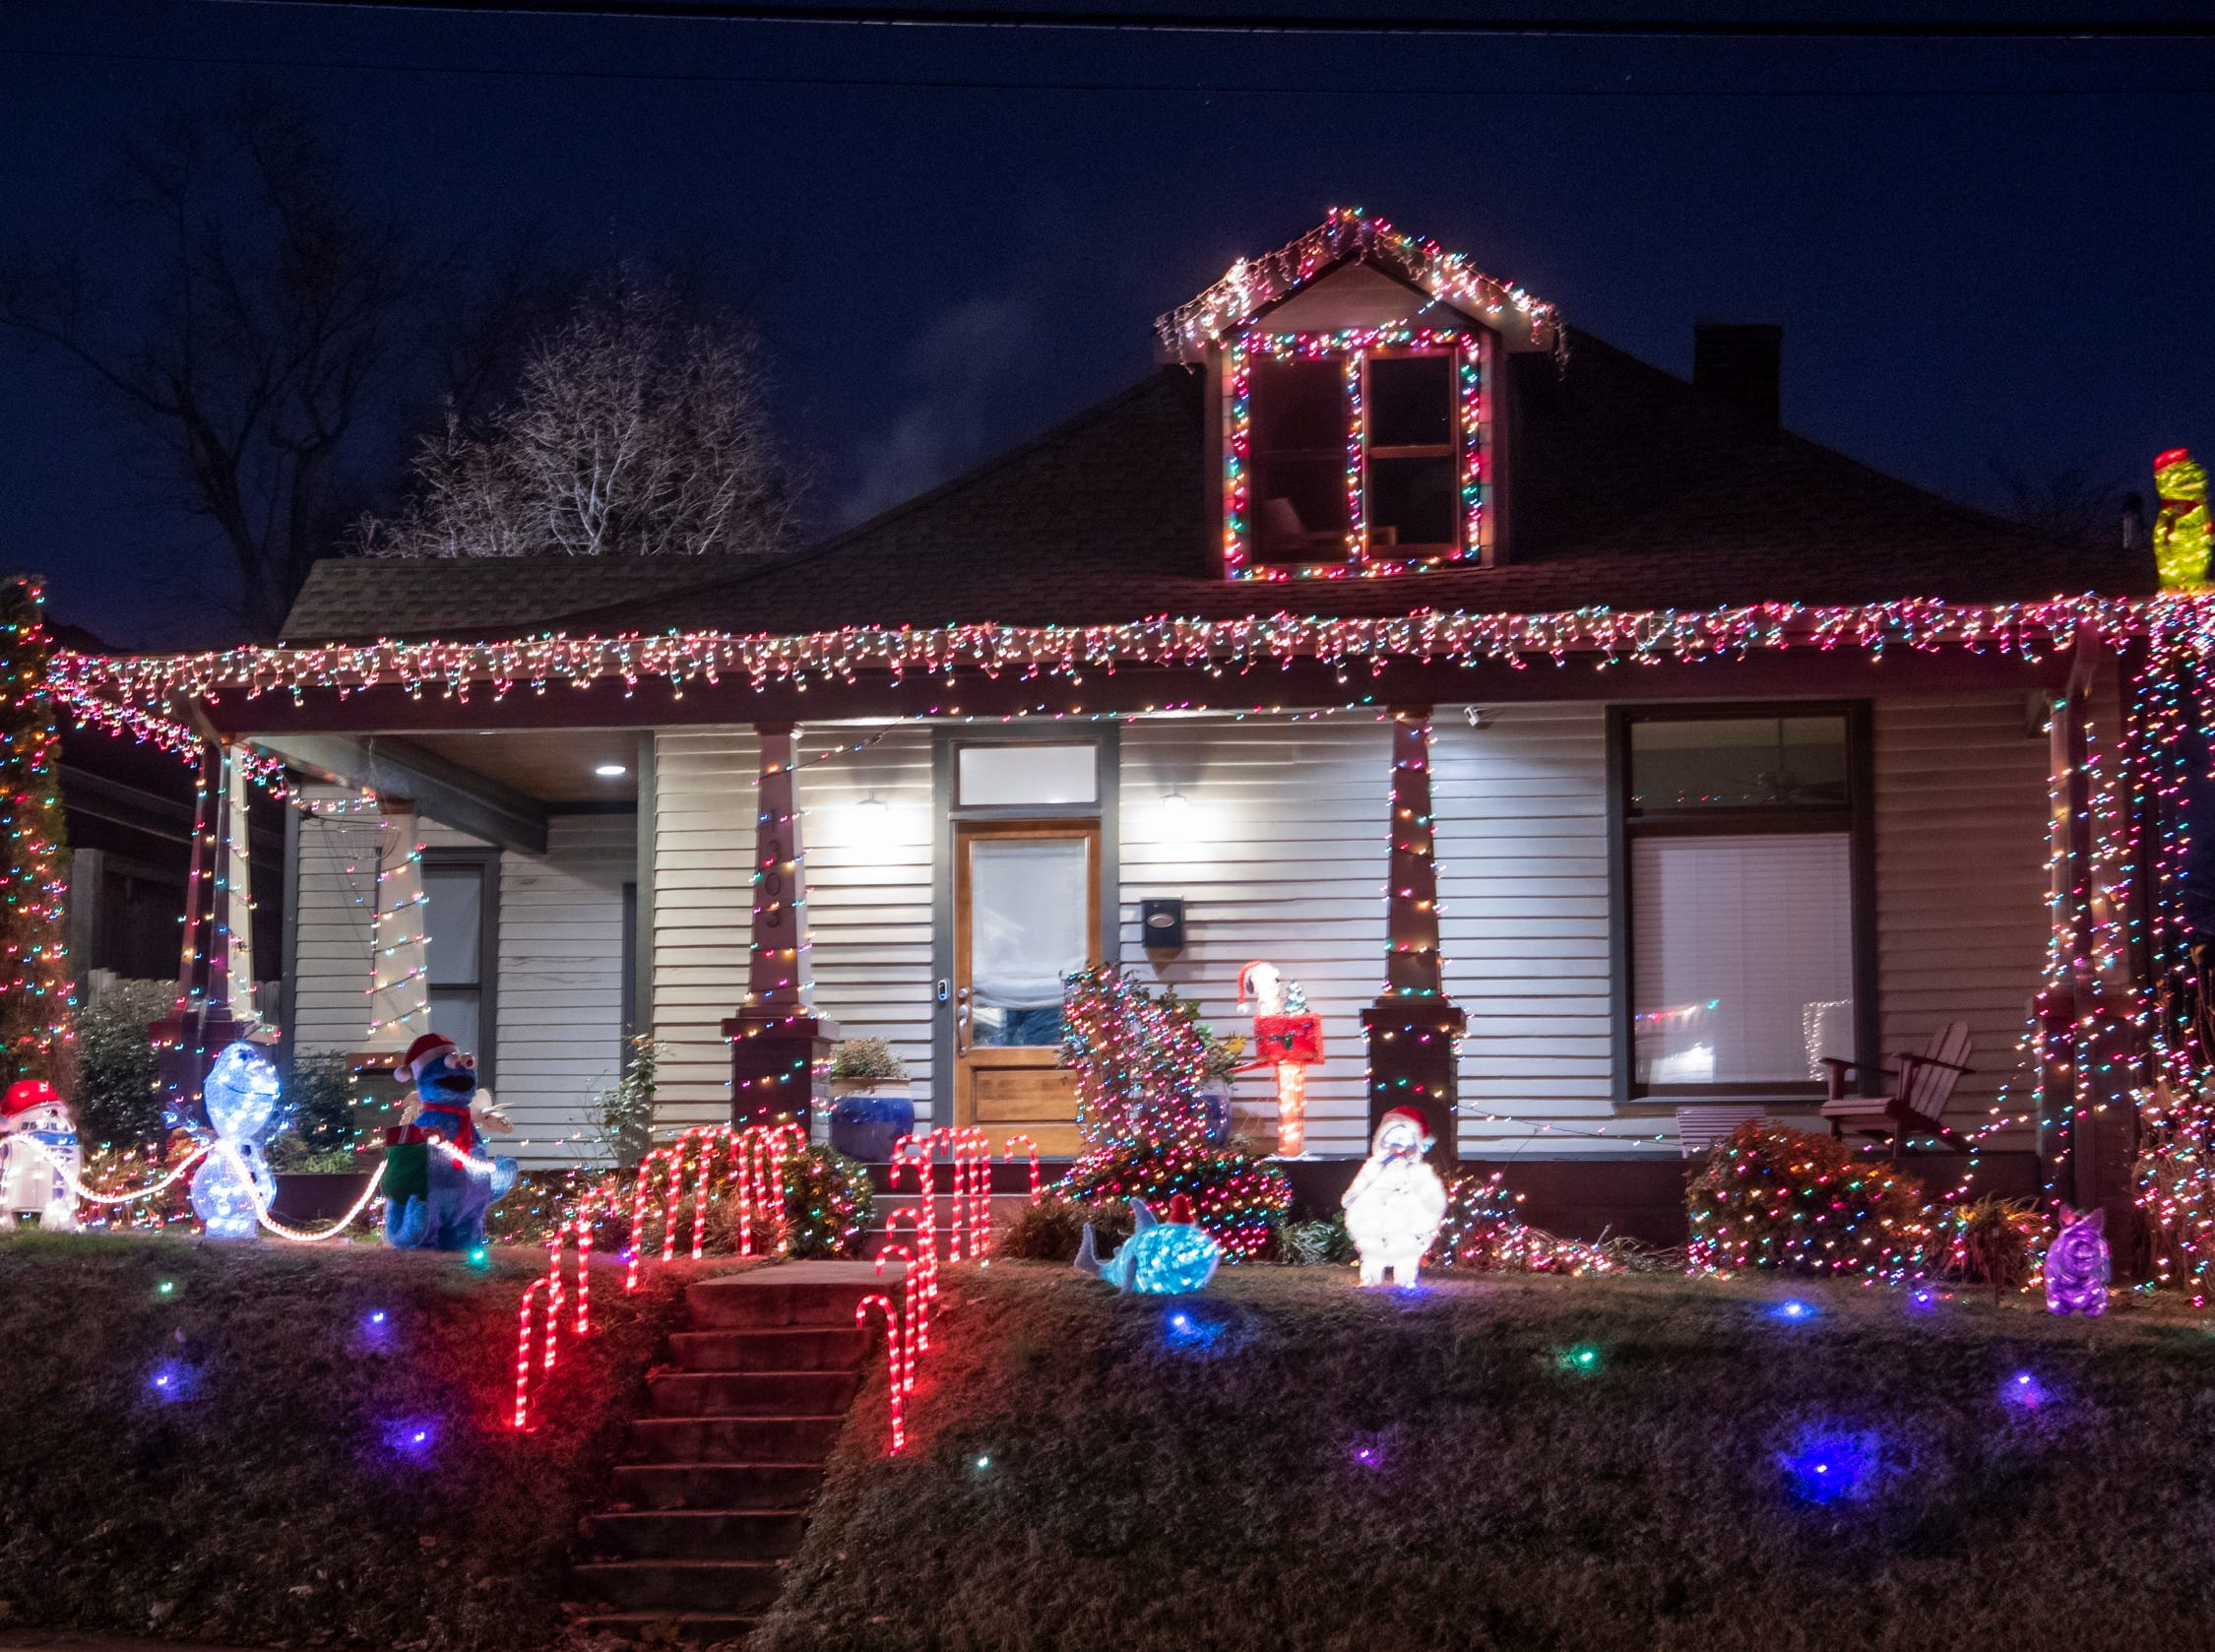 Christmas lights on Shelby Ave. in Nashville, Tenn., Monday, Dec. 10, 2018.